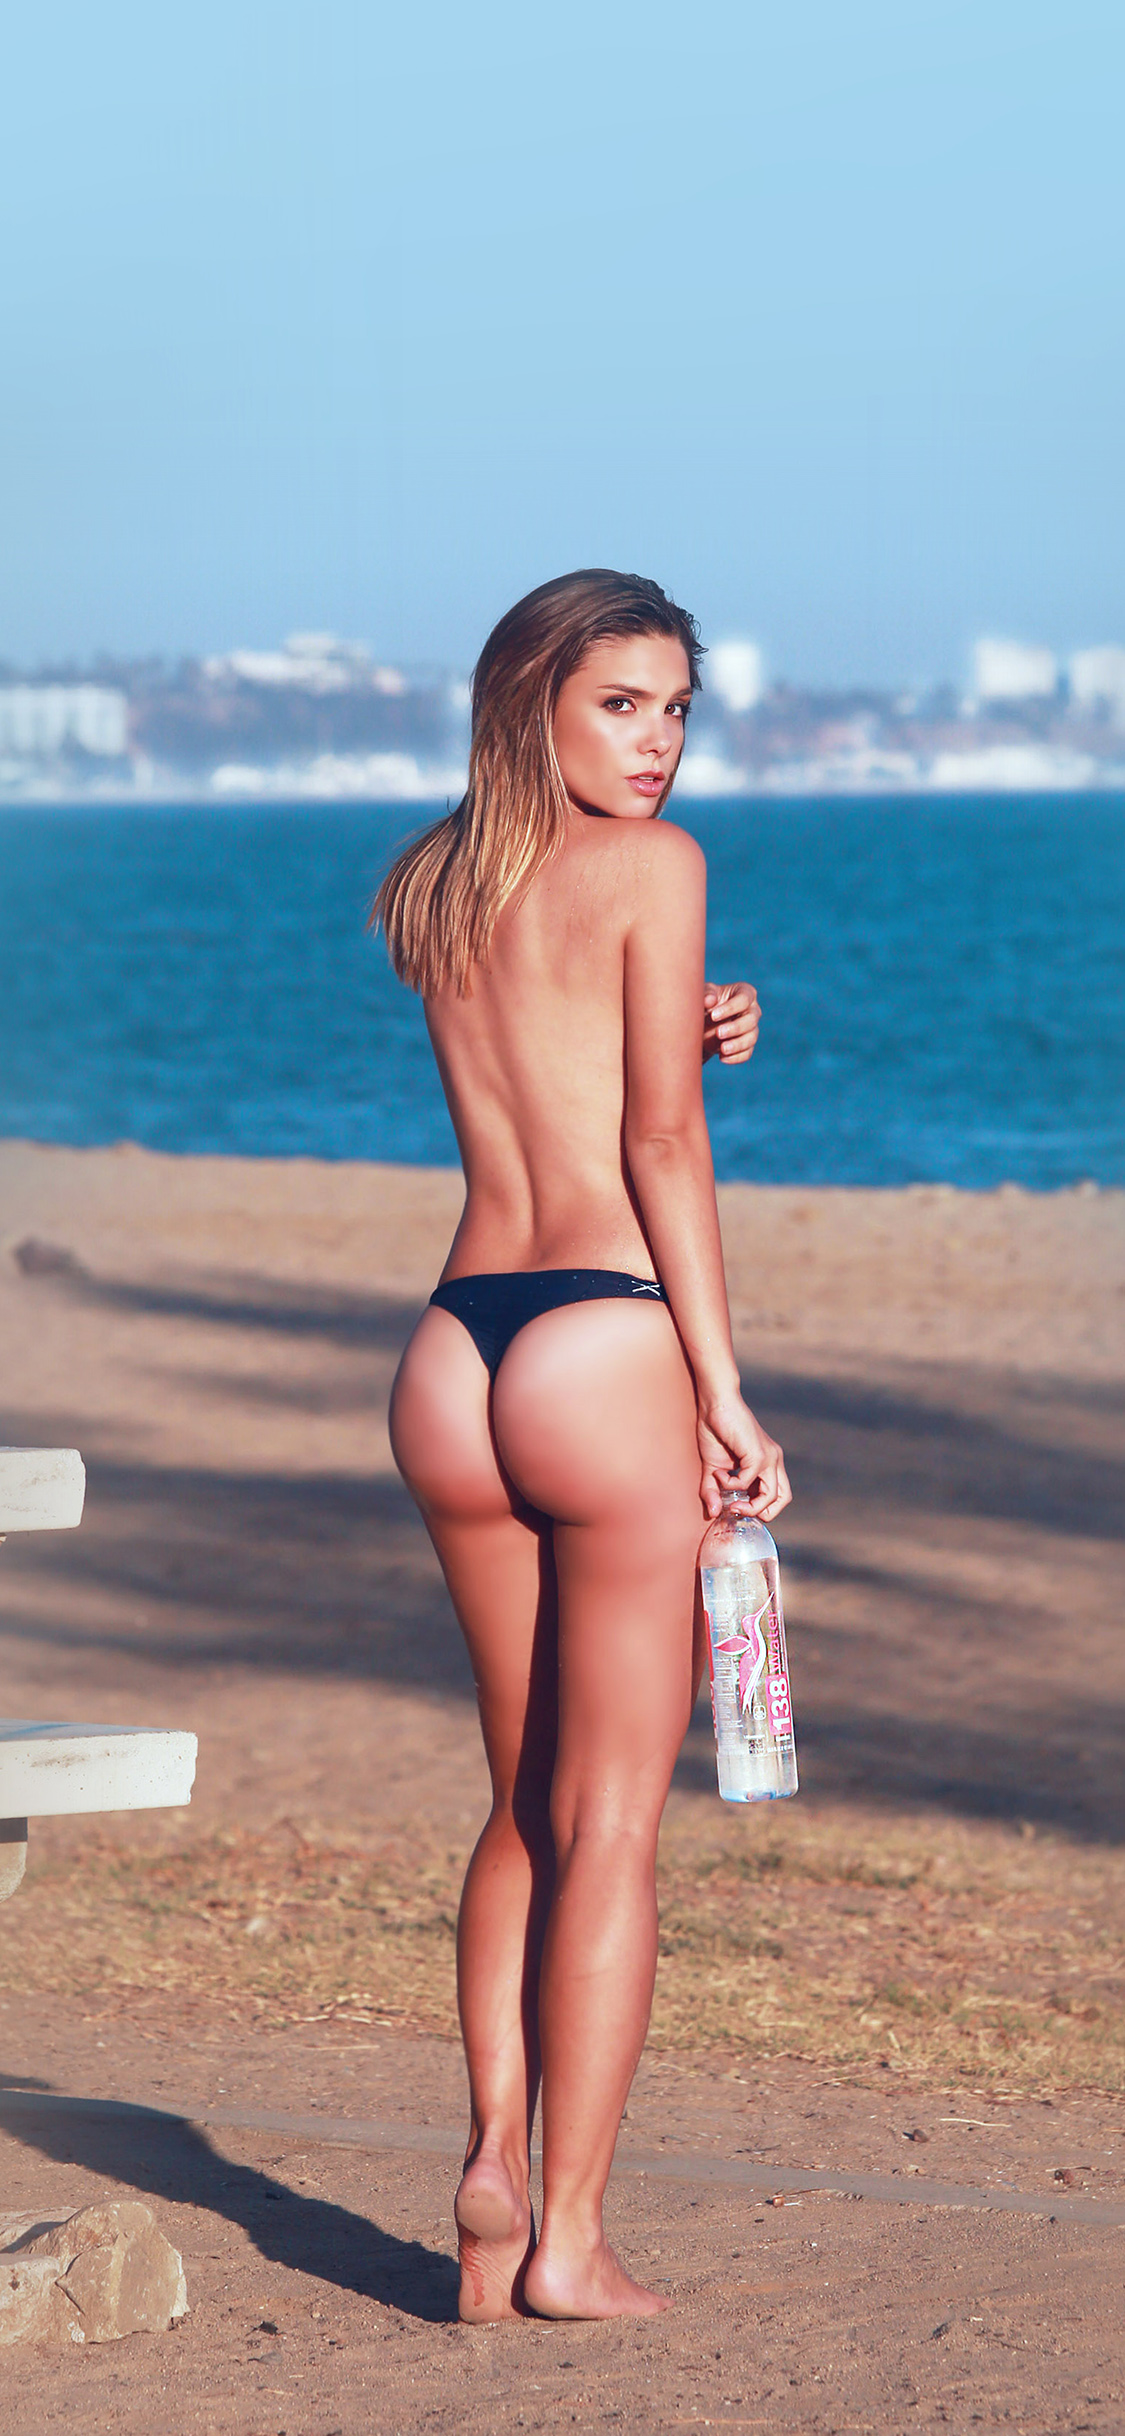 Macbook Pro Wallpaper Hd Hf49 Chelsea Heath Beach Sexy Body Sea Papers Co